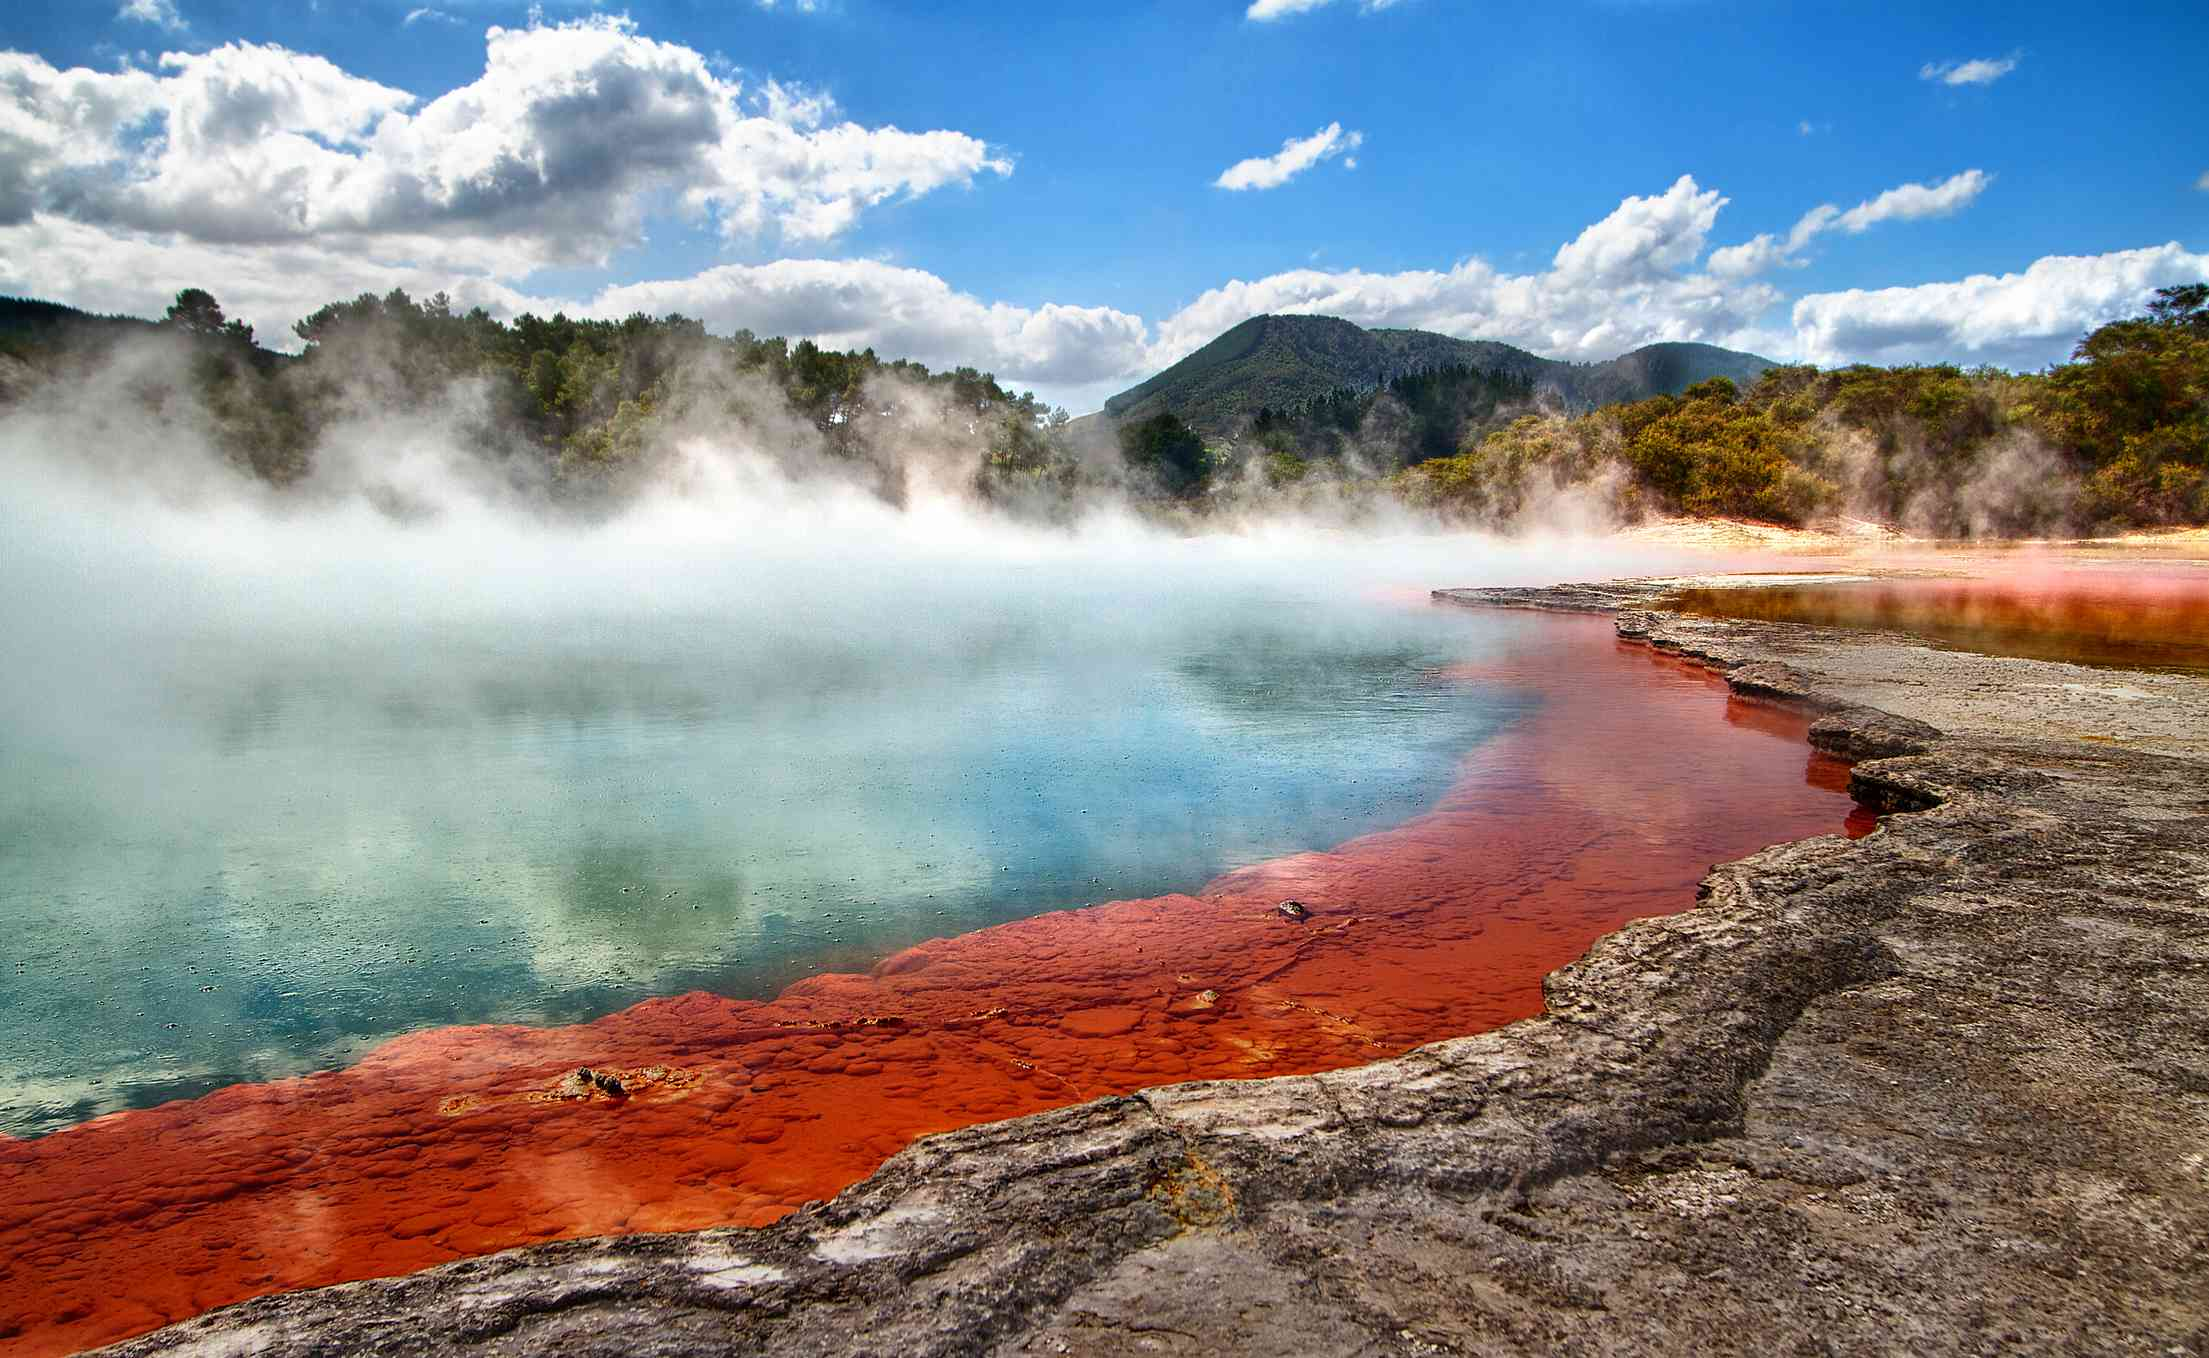 Vapor saliendo de una piscina geotérmica